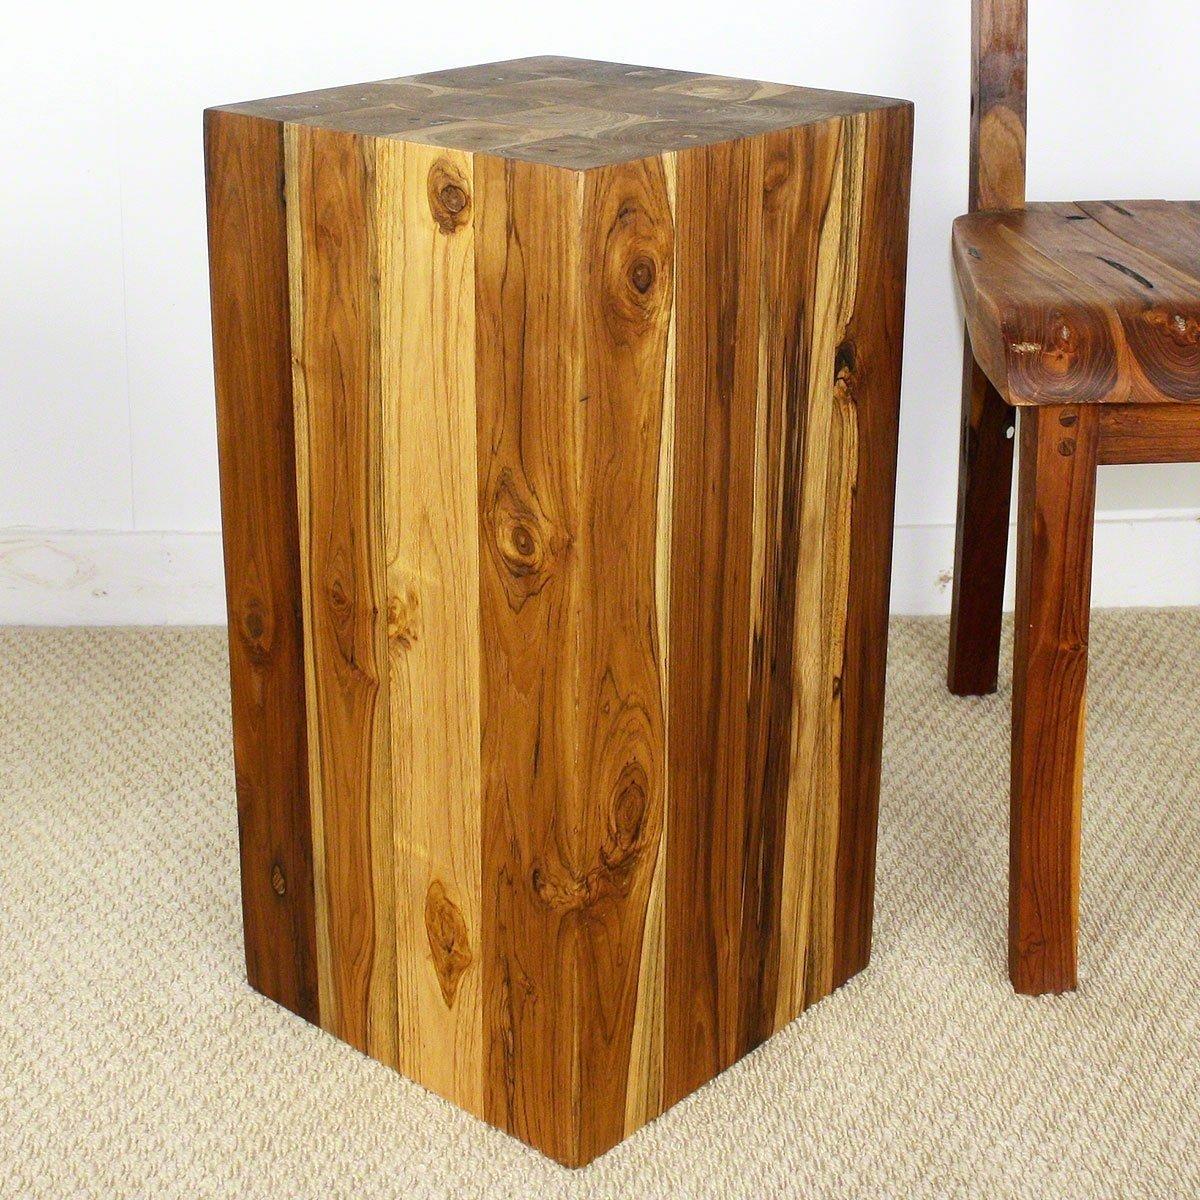 Block Hollow Teak Wood End Table 12x12x23 Inch H W Eco Friendly Livos Walnut Oil